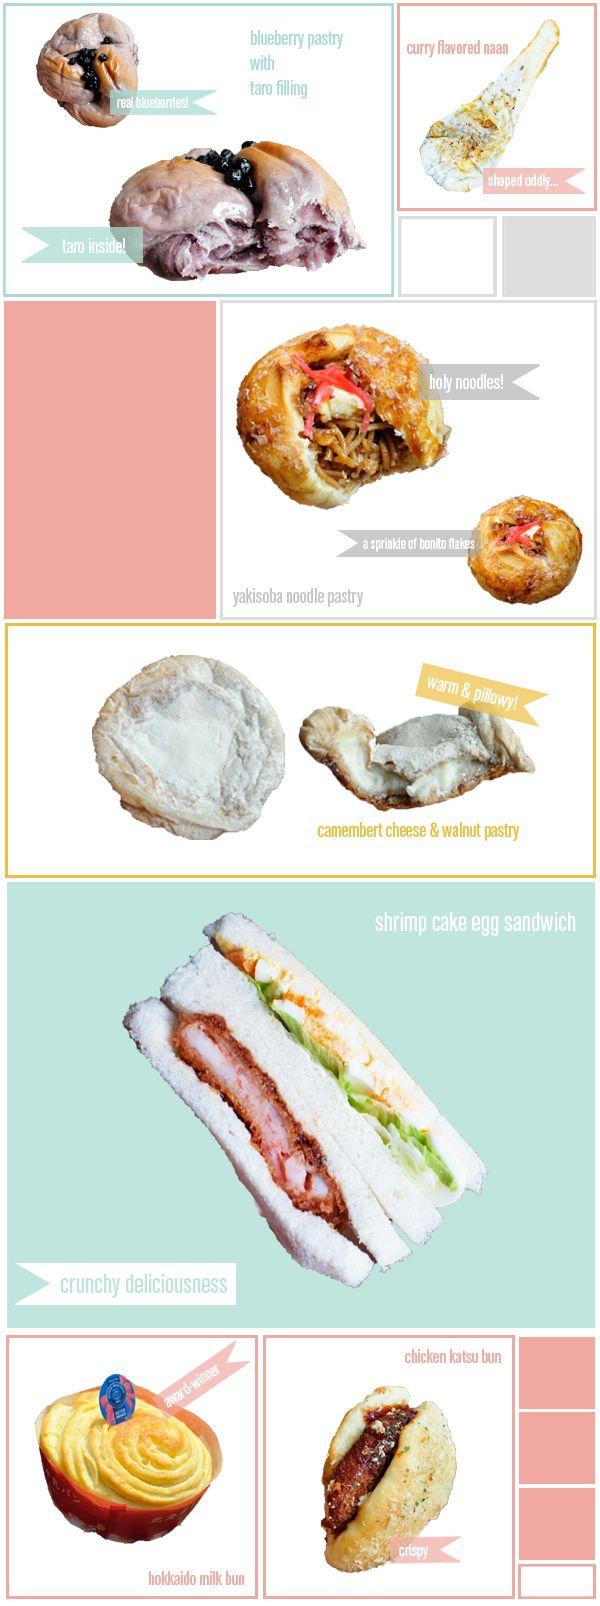 Mont Thabor Bakery Goodies in Azubu-juban Neighborhood in Tokyo, Japan: Blueberry Pastry, Curry-Flavored Naan, Yakisoba Noodle Pastry, Camembert Cheese &  Walnut Pastry, Shrimp Cake Egg Sandwich, Hokkaido Milk Bun, and Chicken Katsu Bun